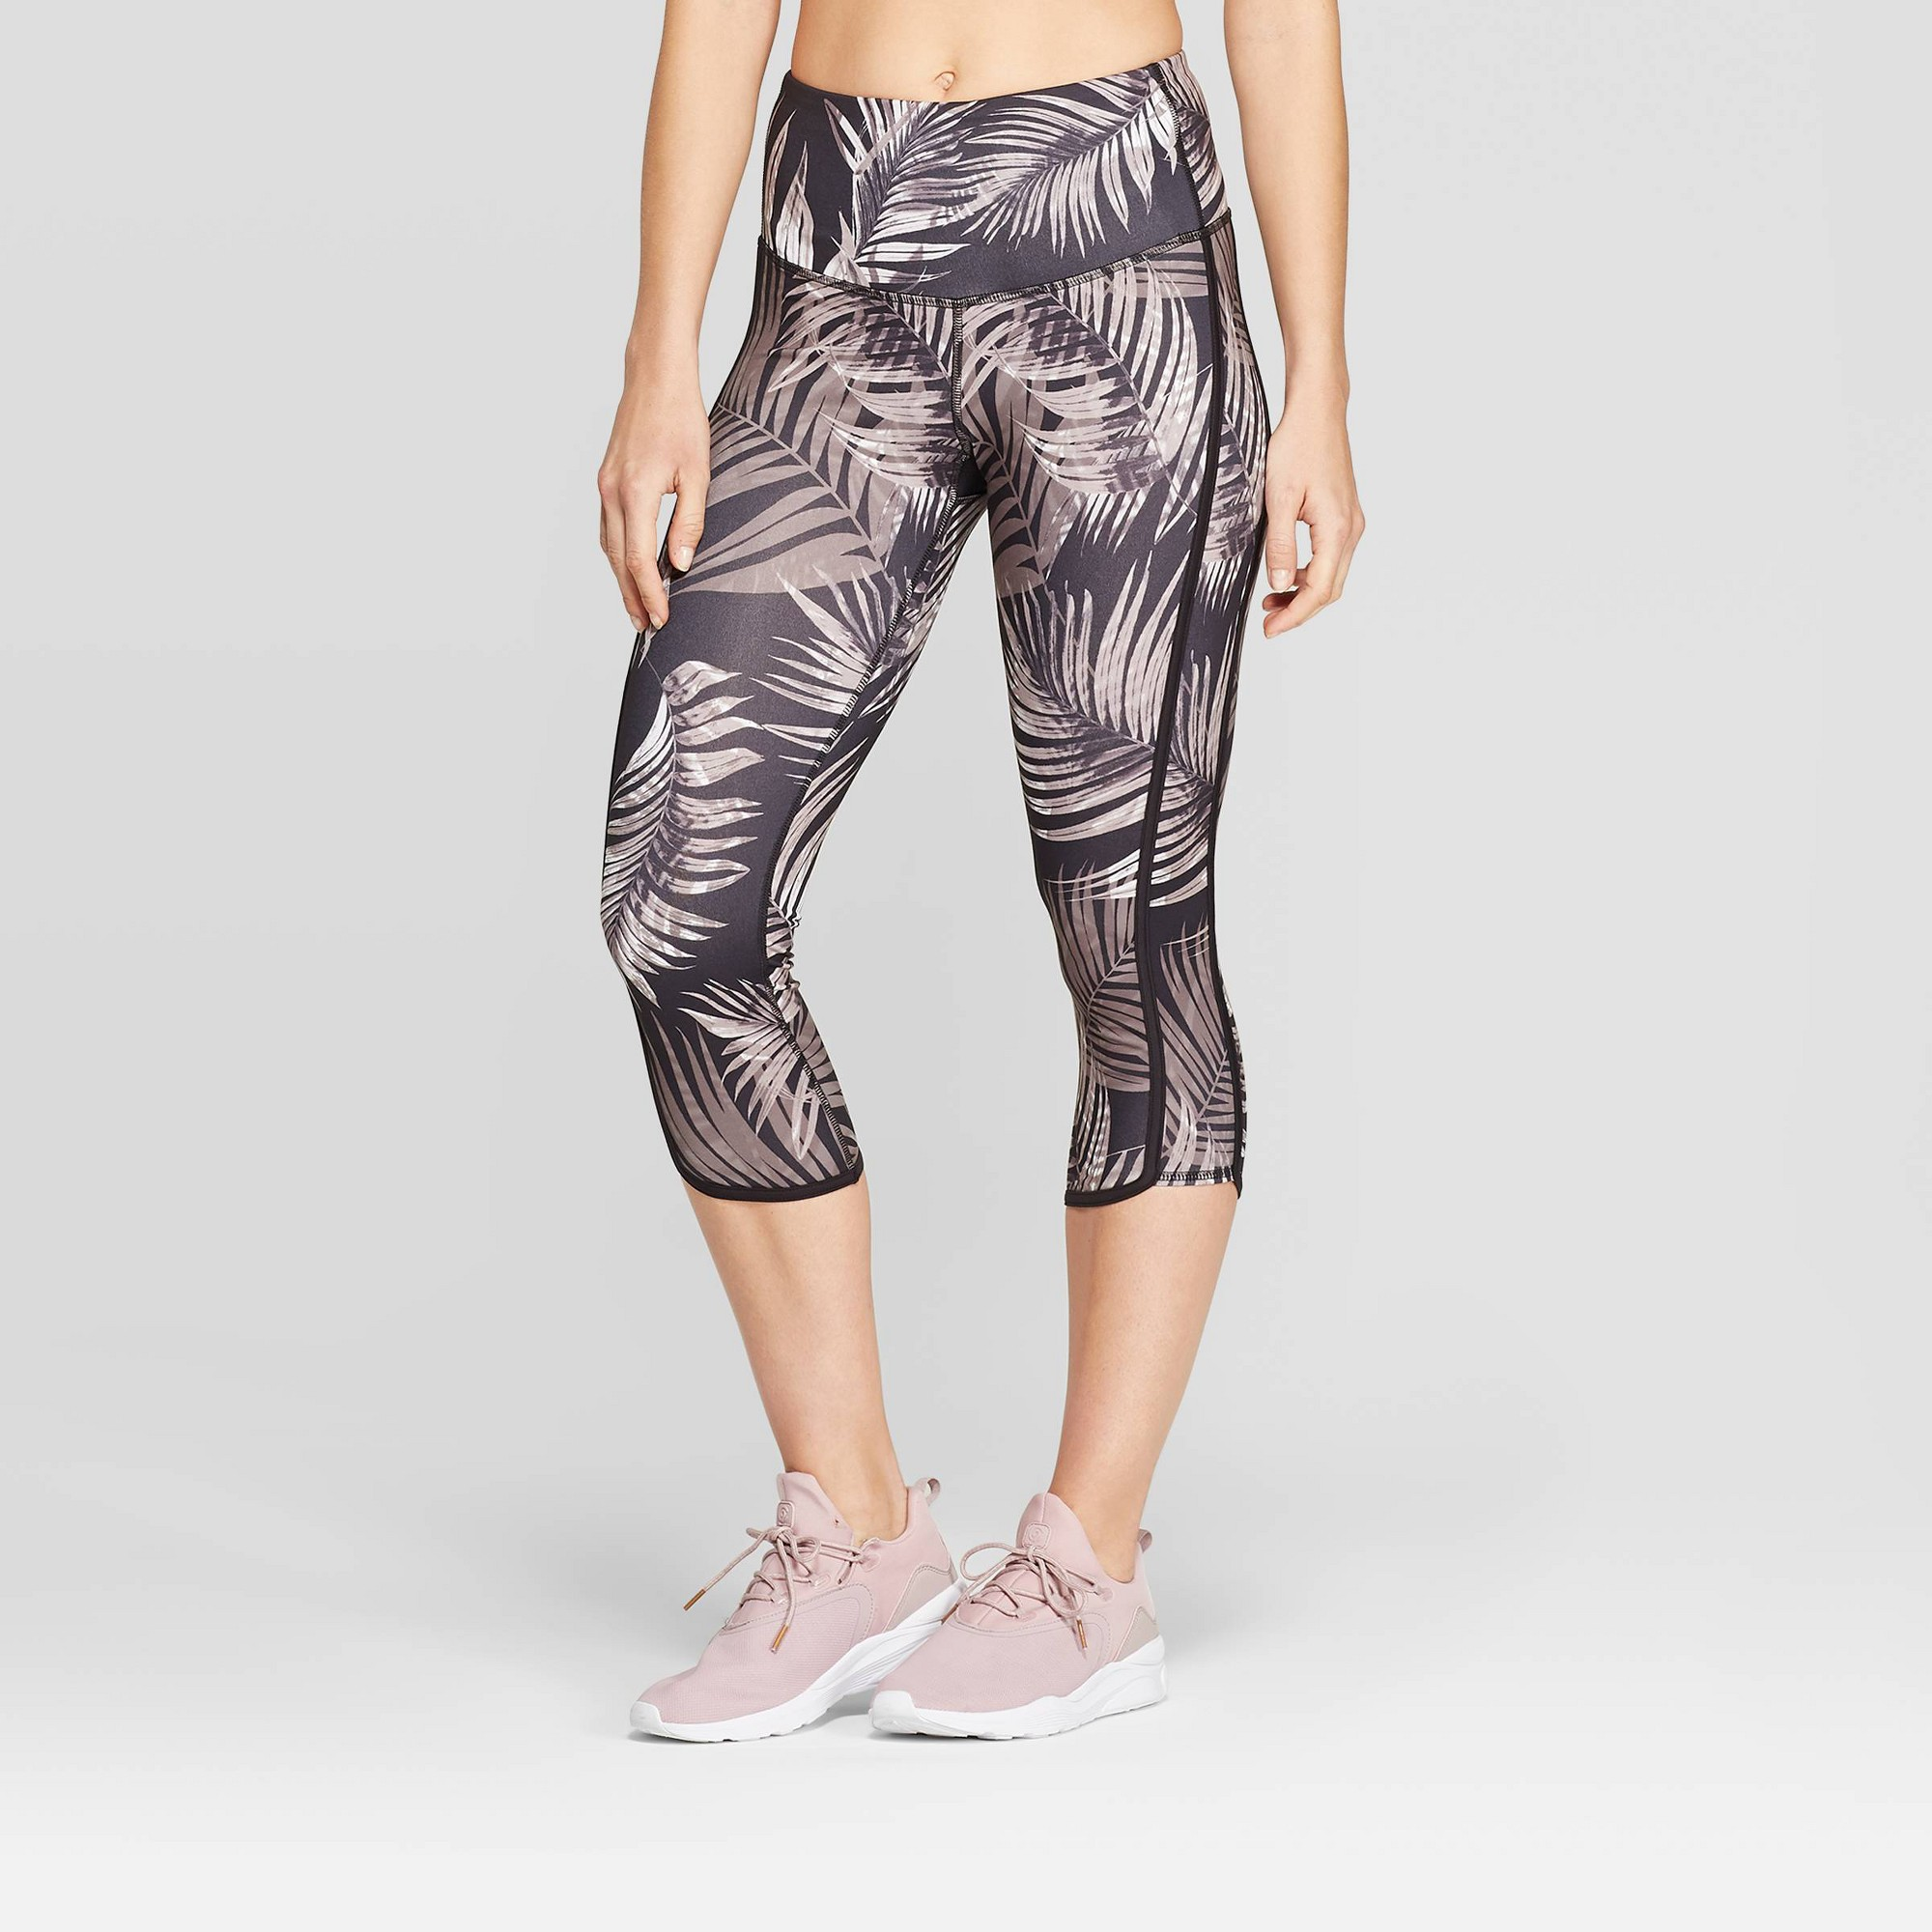 Women's Everyday High-Waisted Tropical Print Capri Leggings 20 - C9 Champion Gray XL